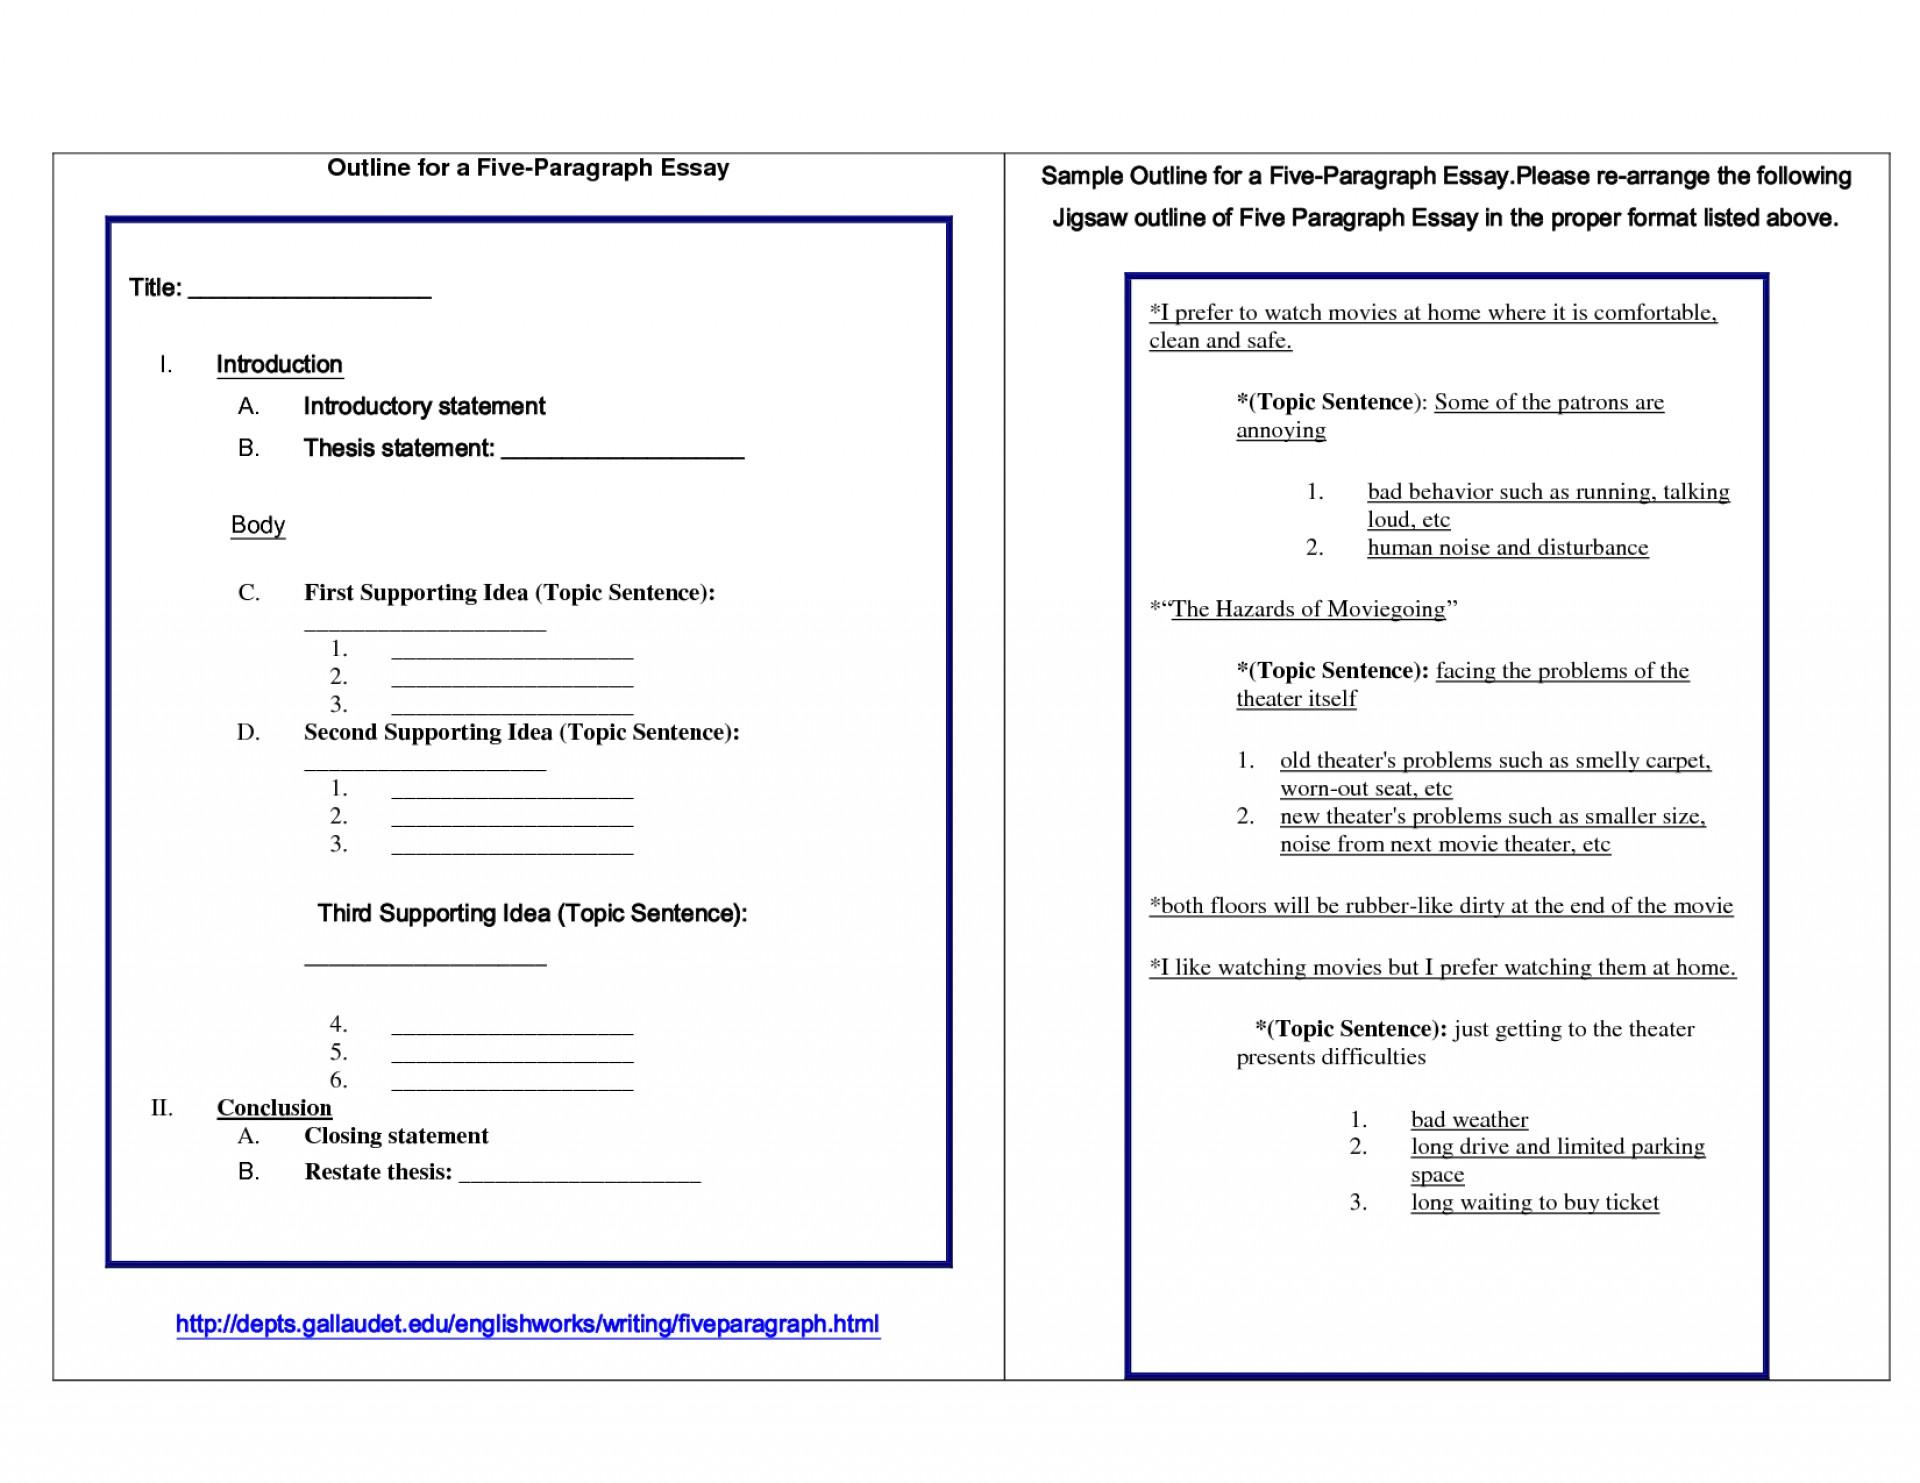 008 Bunch Ideas Of Paragraph Essay Outline Persuasive Template Az Unique And Example Five Stirring Format Teaching Argumentative 1920